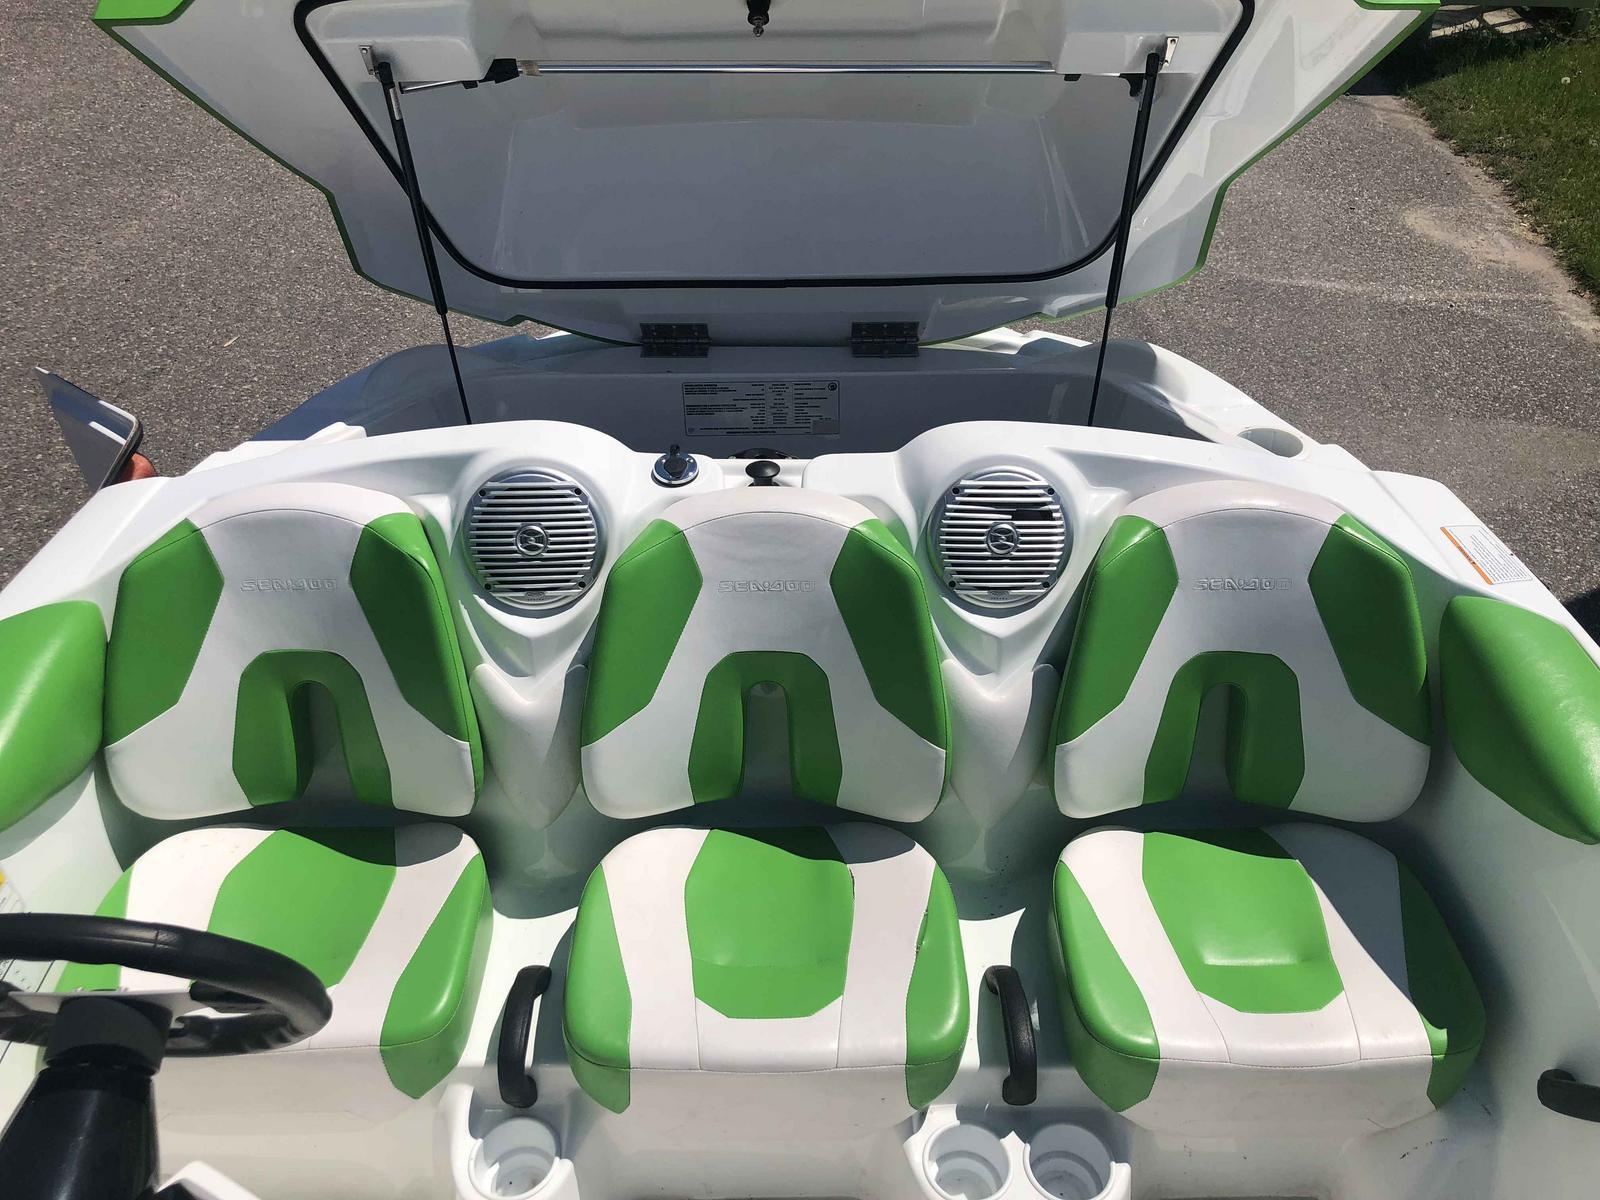 2012 Sea-Doo Sport Boats 150 Speedster® for sale in